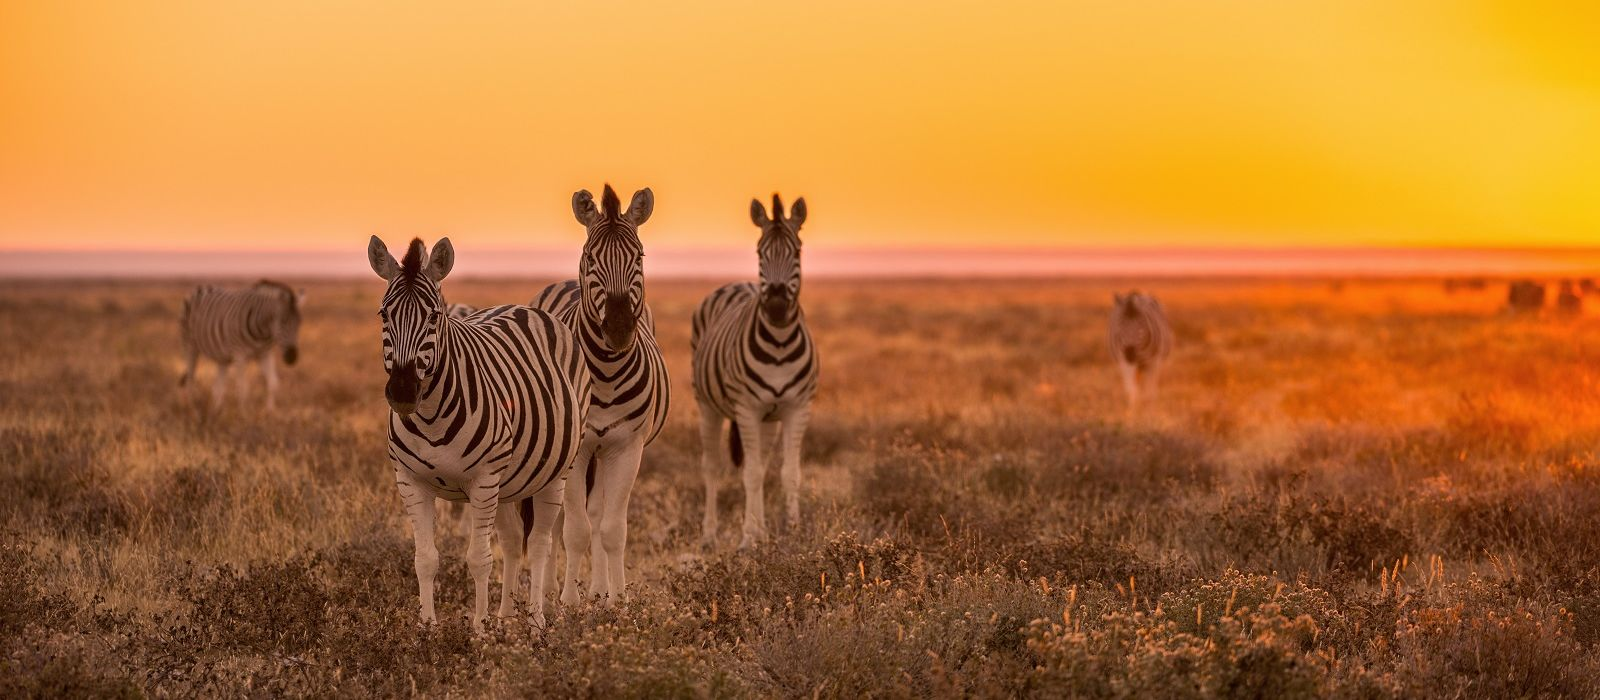 Selbstfahrer-Reise nach Südafrika, Namibia & Simbabwe: Nord Kap via Caprivi und Viktoriafälle Urlaub 4